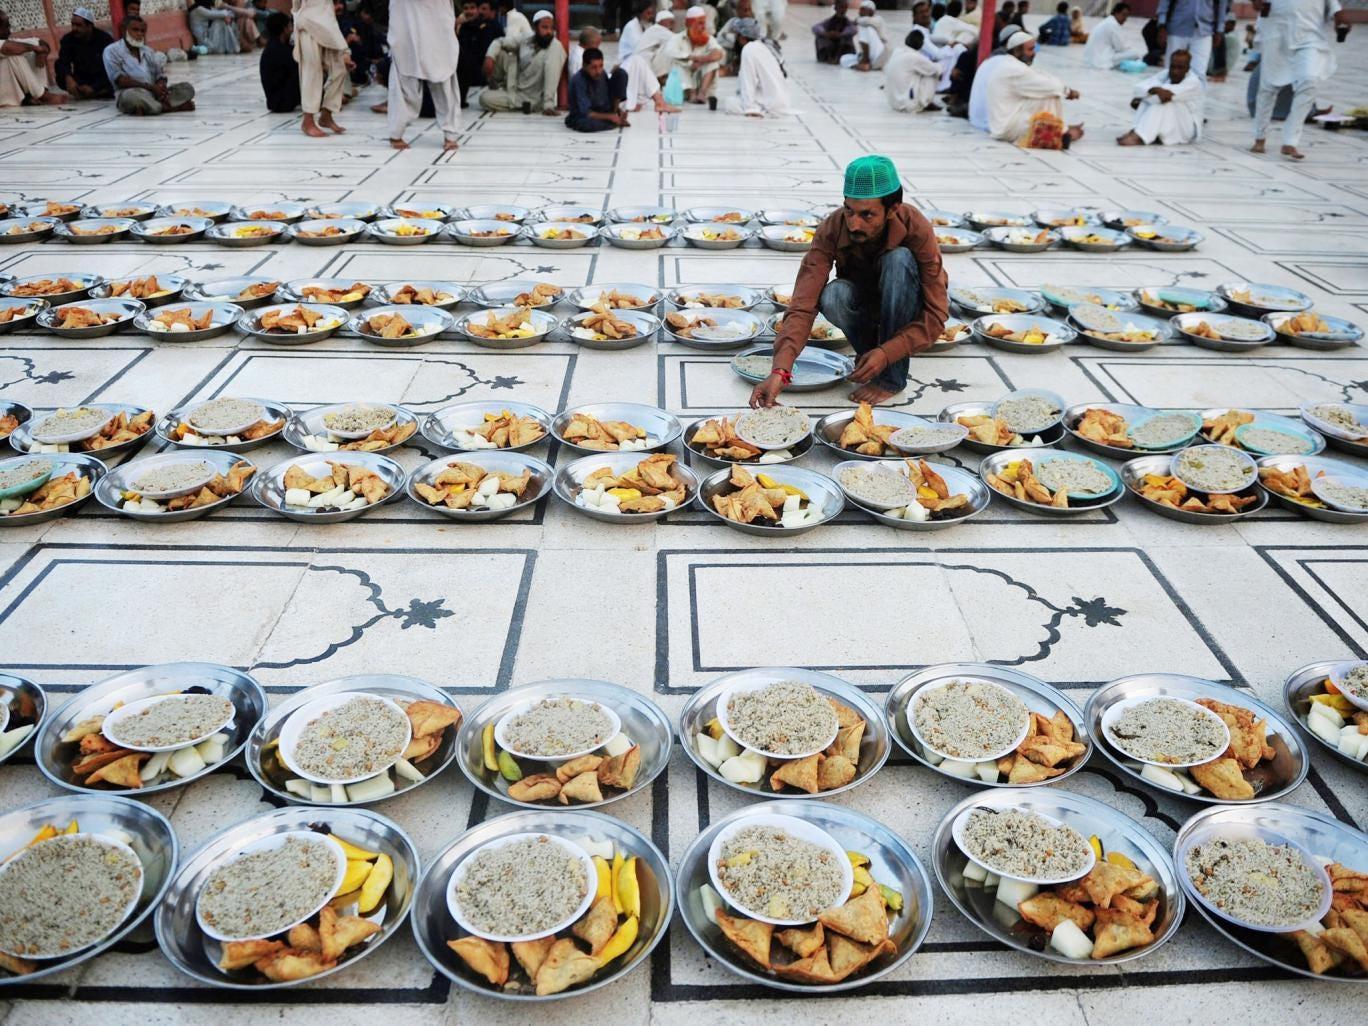 A Pakistani Muslim man arranges Iftar food for Muslim devotees